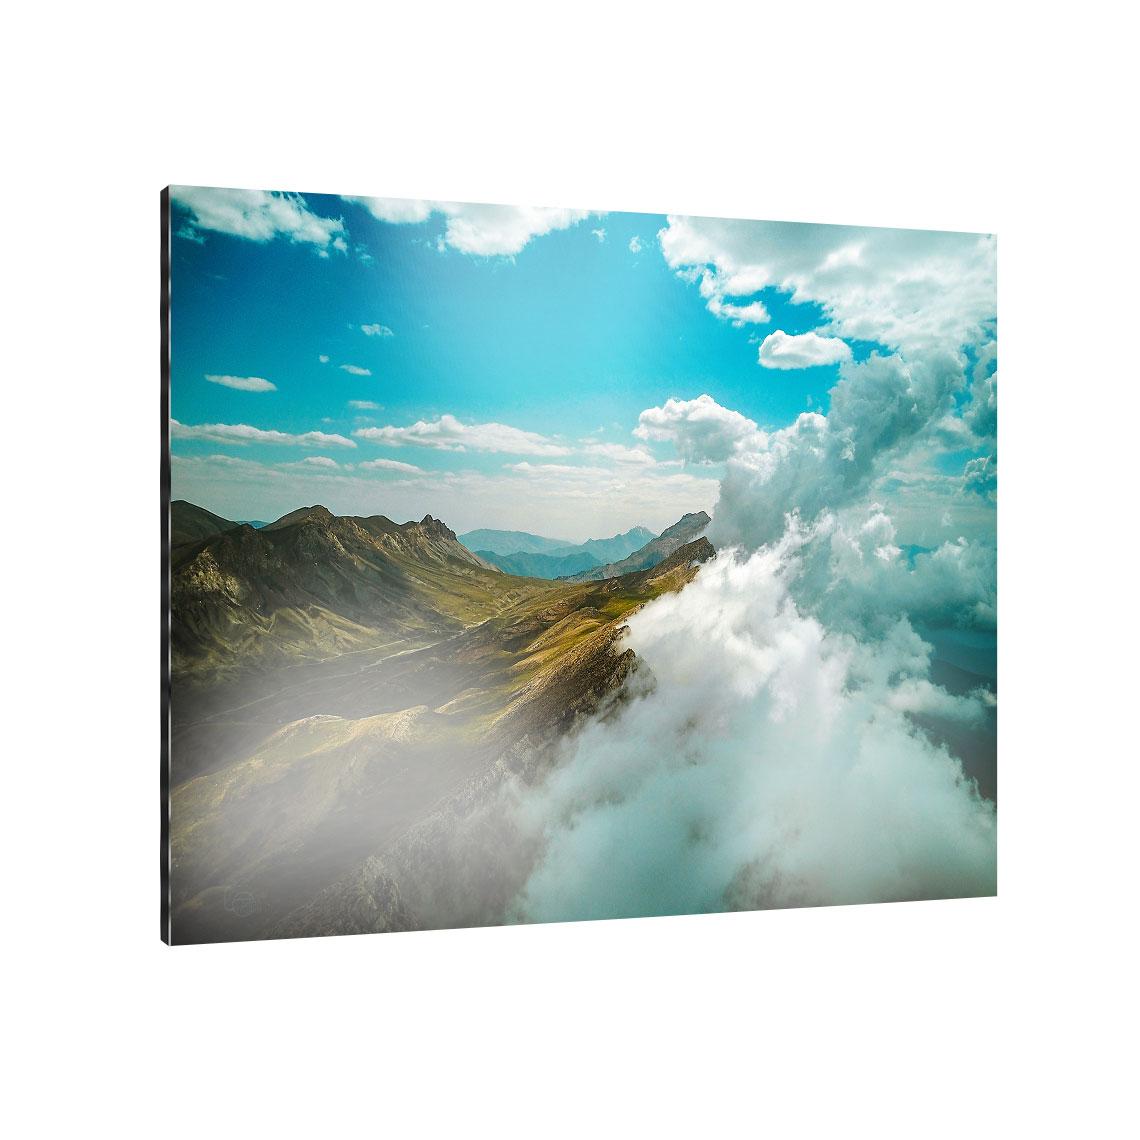 premium metal print 30x45cm 12x18 premium metal prints canvas